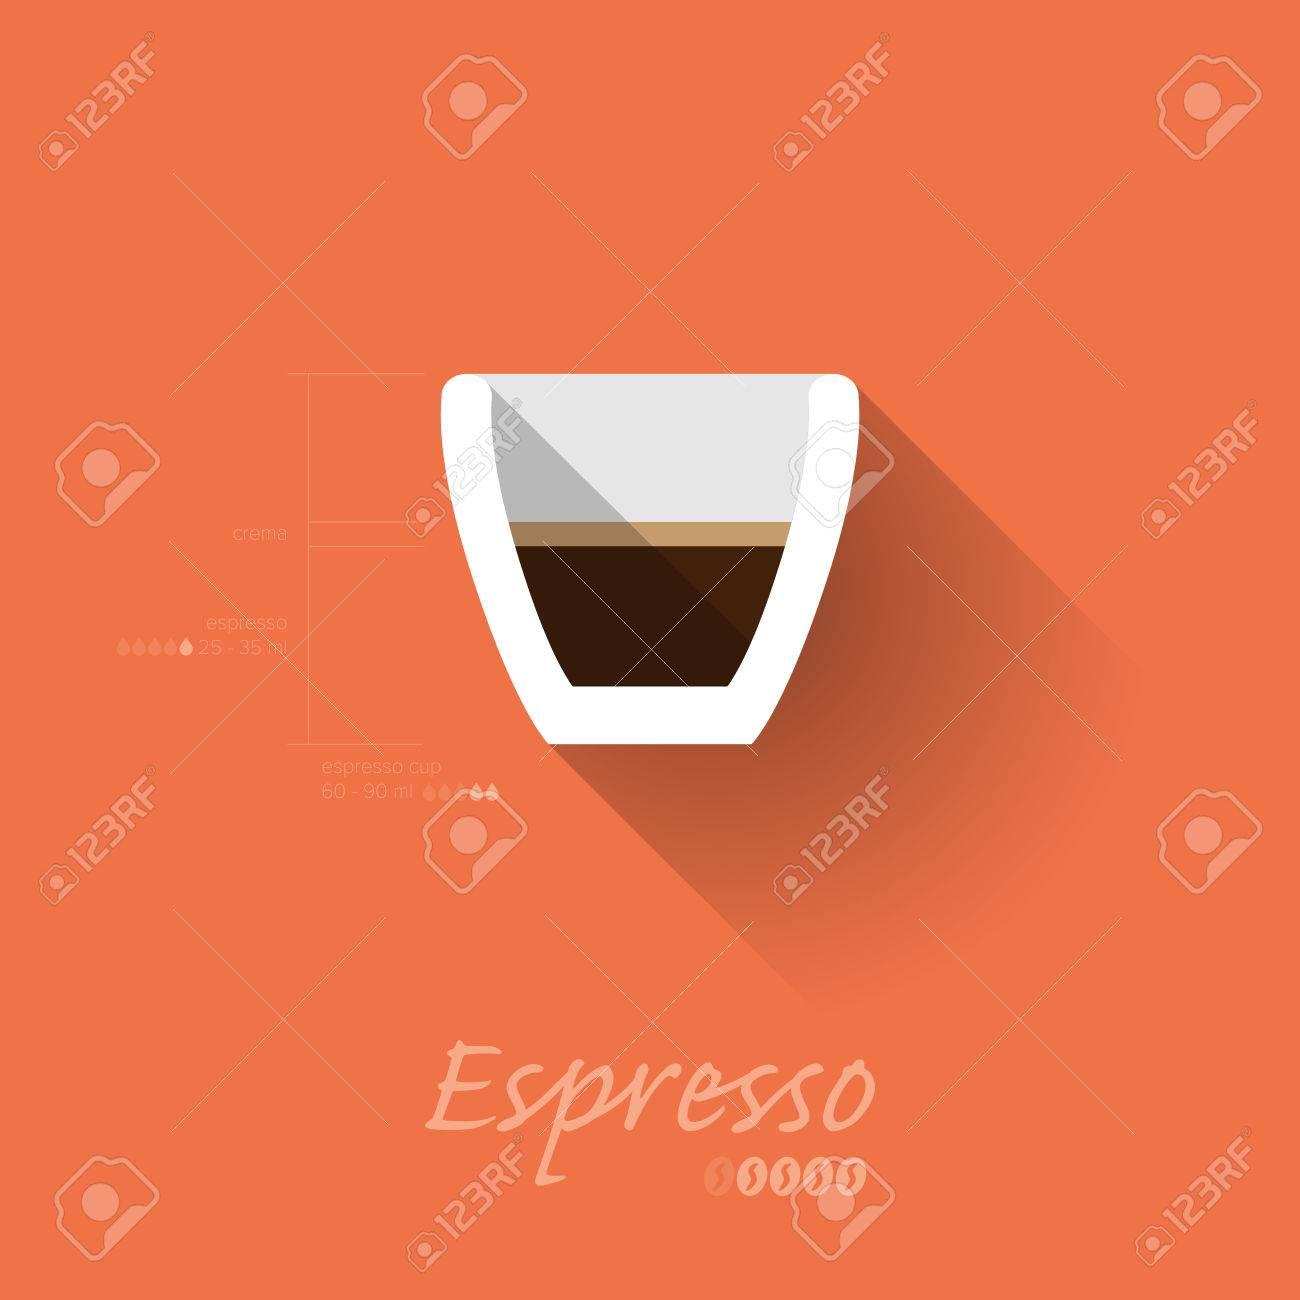 Simple Modern Espresso Manual Wallpaper - Flat Design - Vector Illustration Stock Vector - 24393856